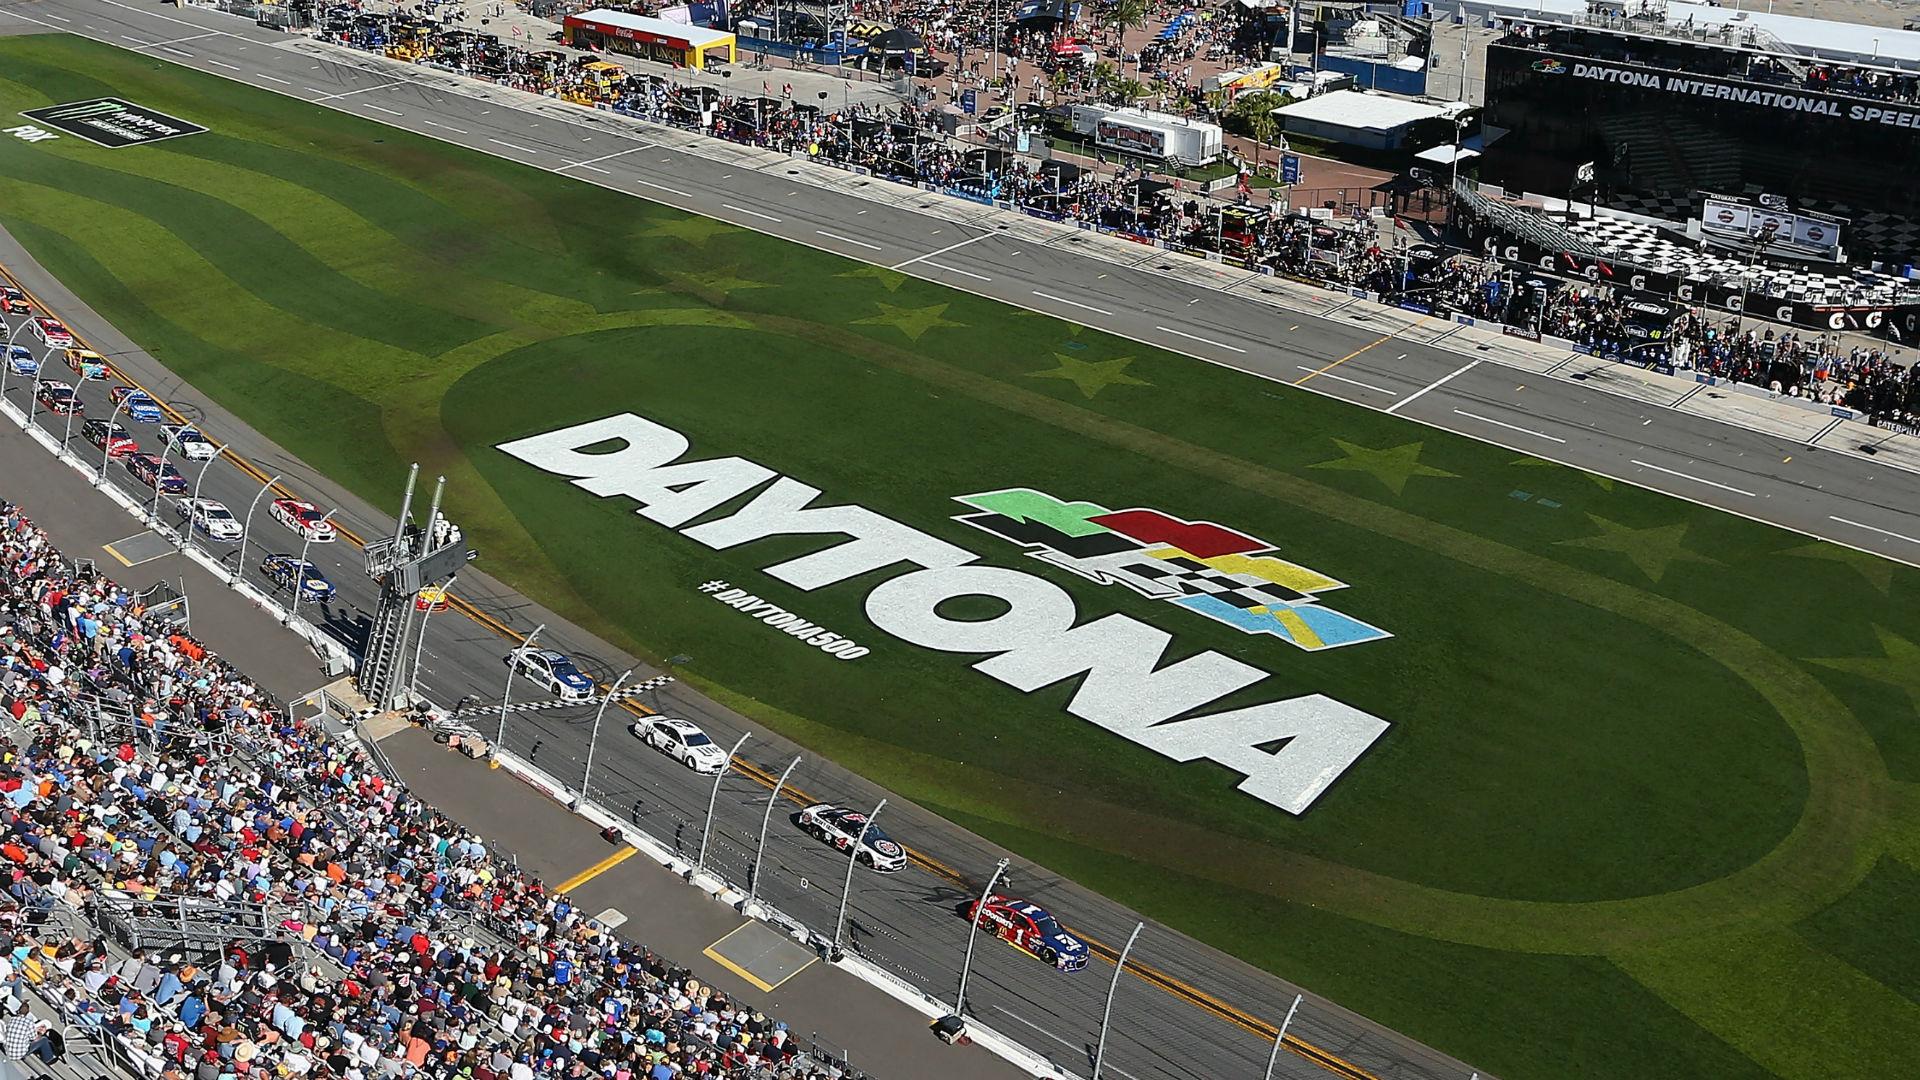 When is the 2018 Daytona 500?